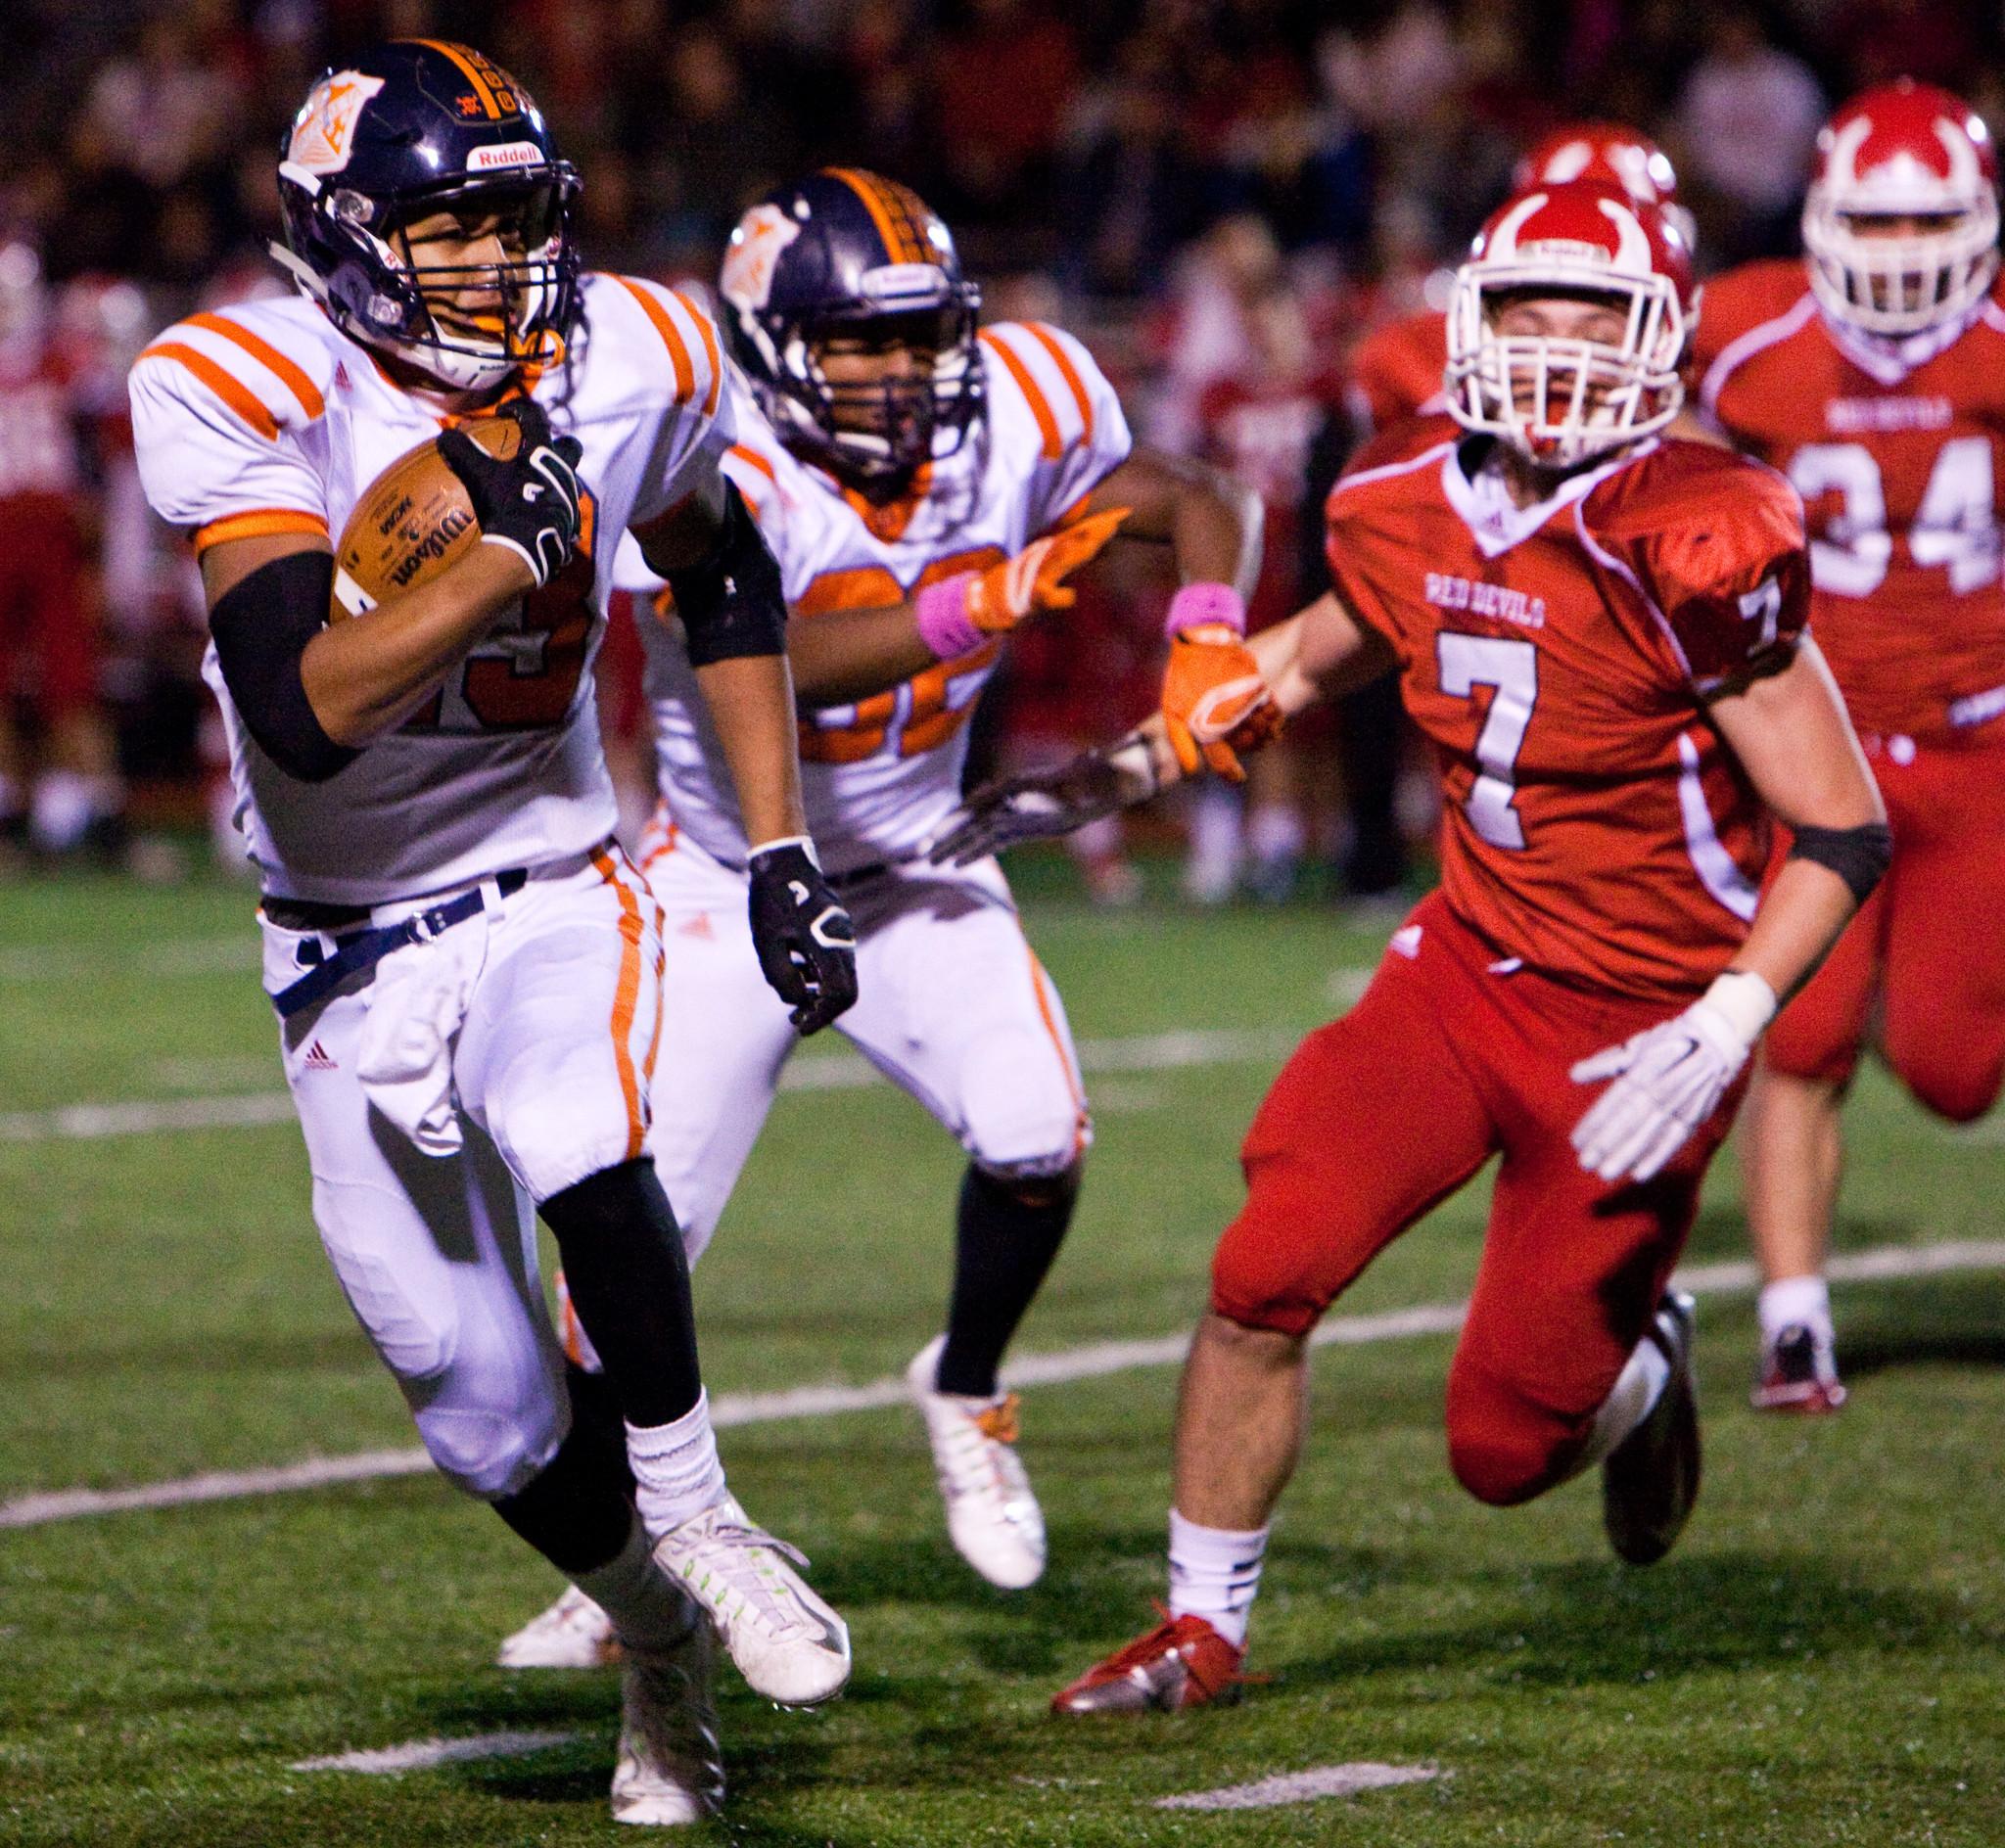 Football Oak Park Vs Hinsdale Central Rancho Santa Fe Review